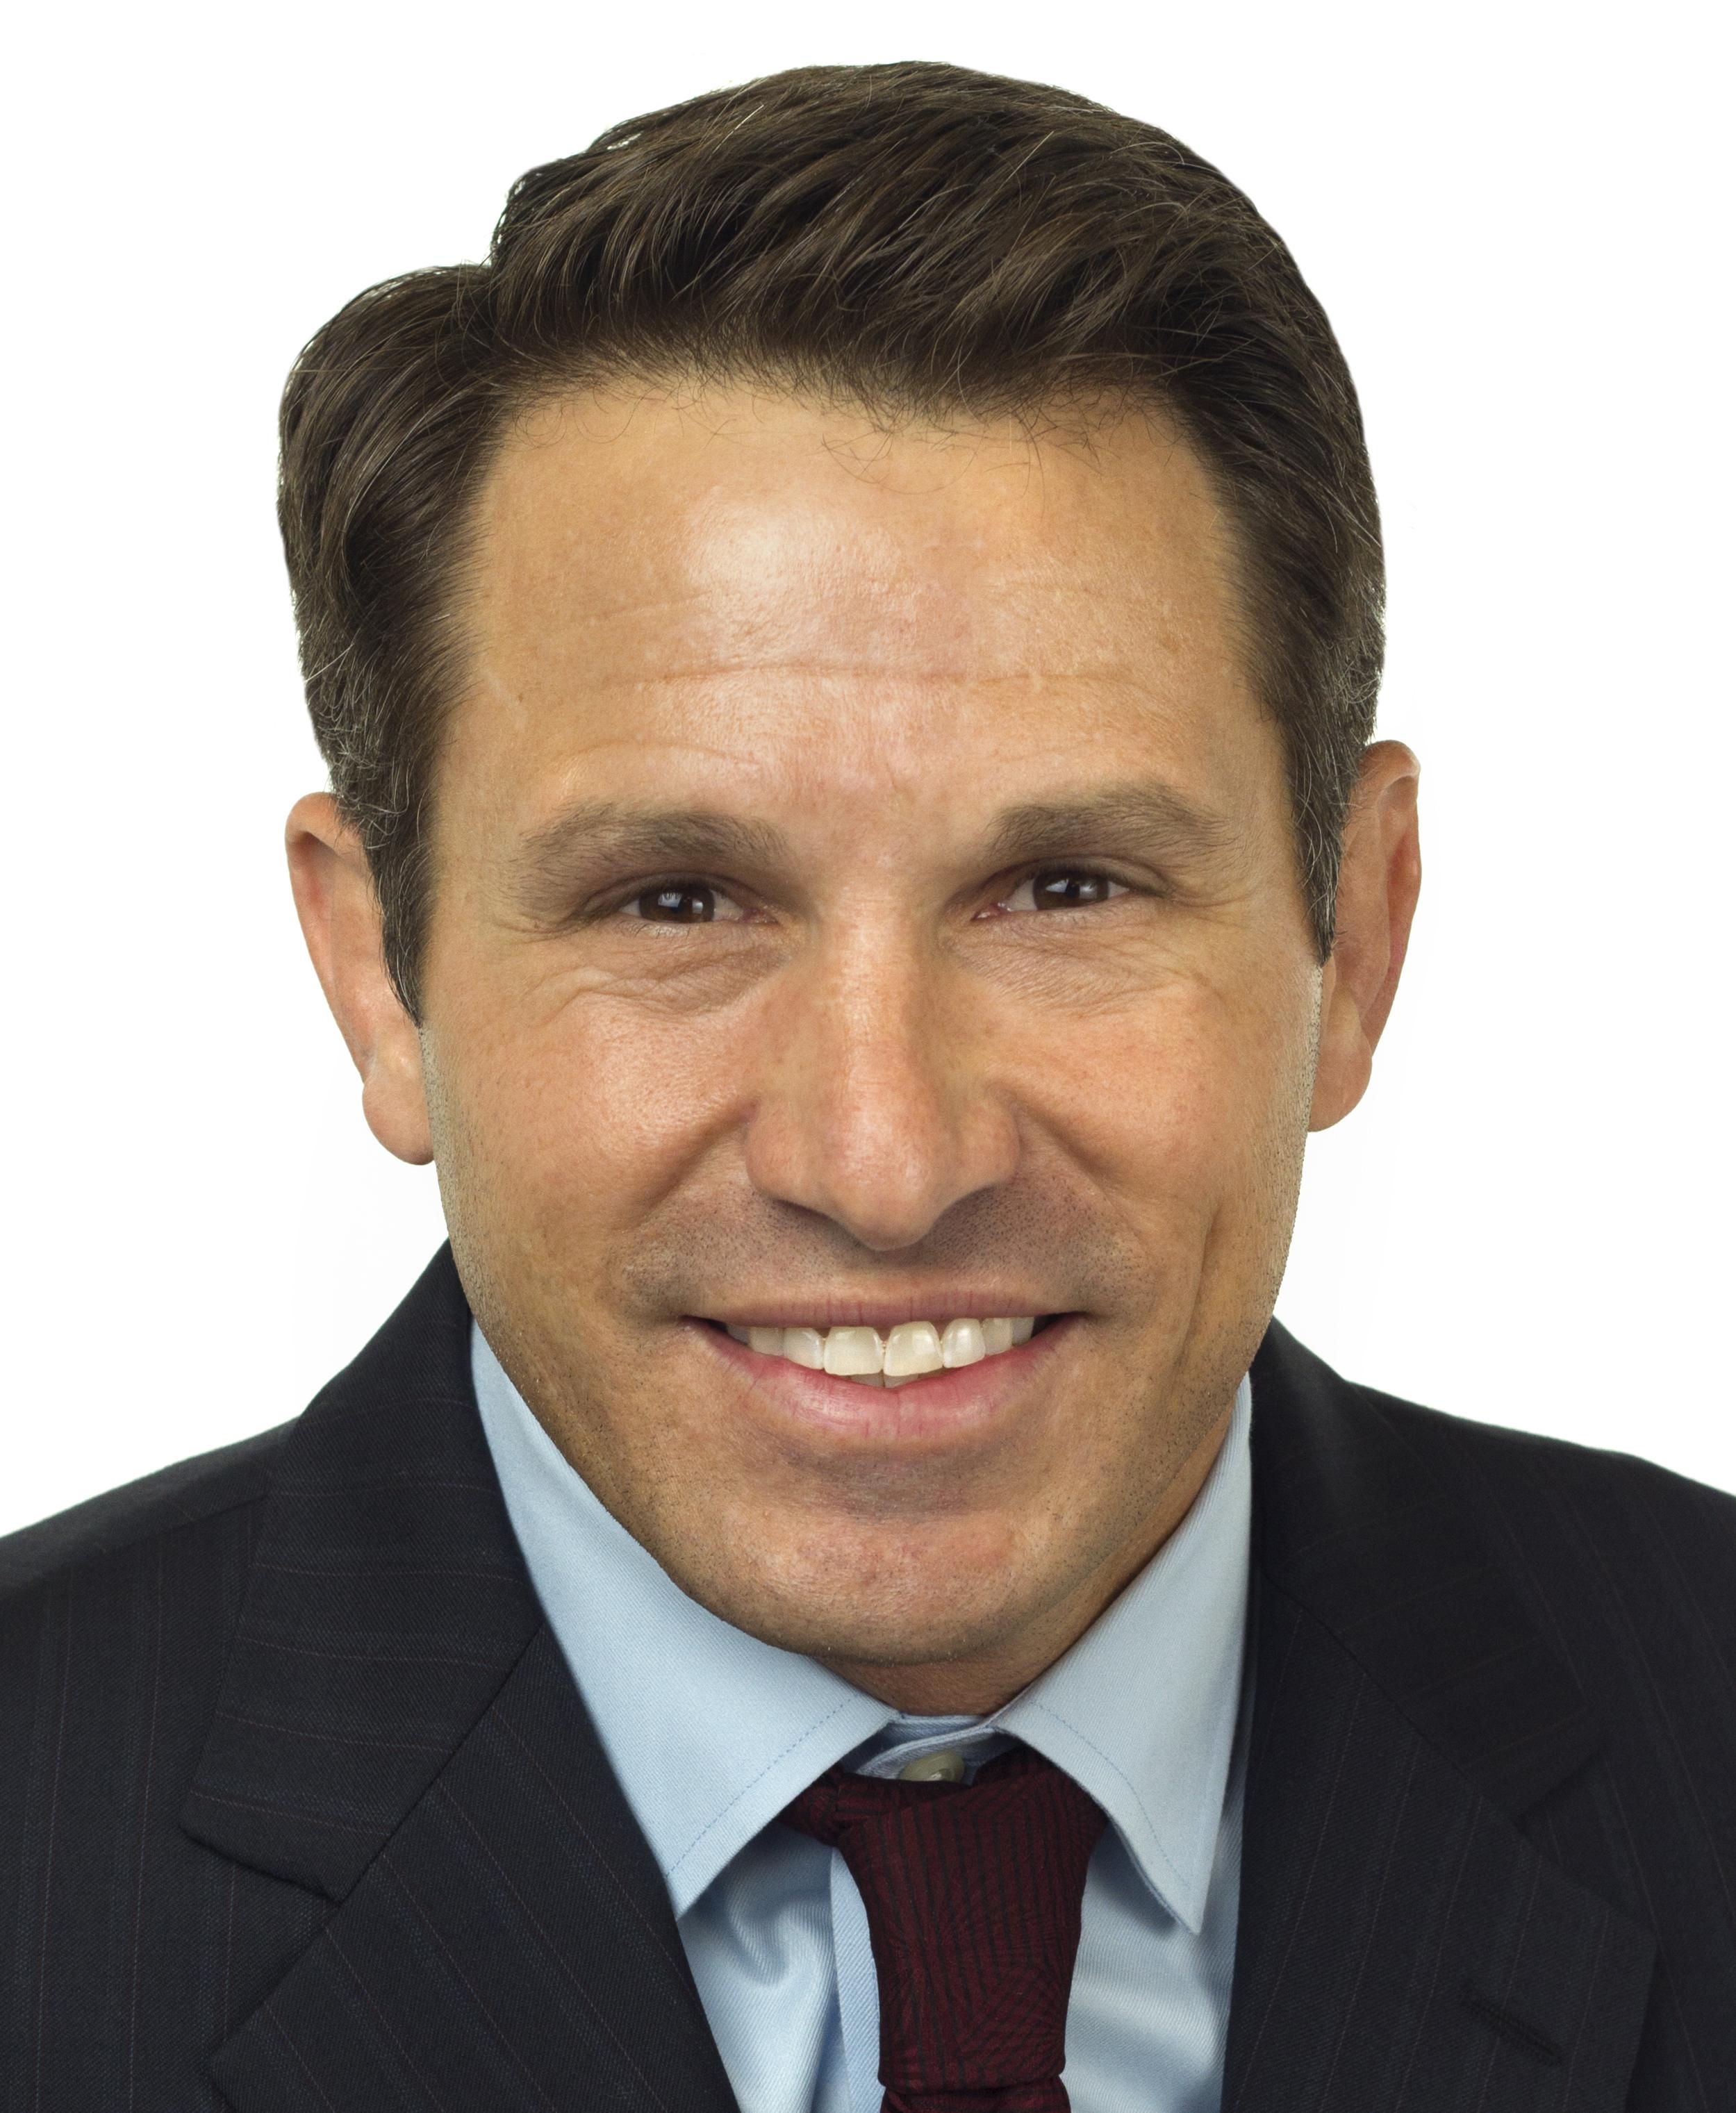 Jeffrey L. Nowlin